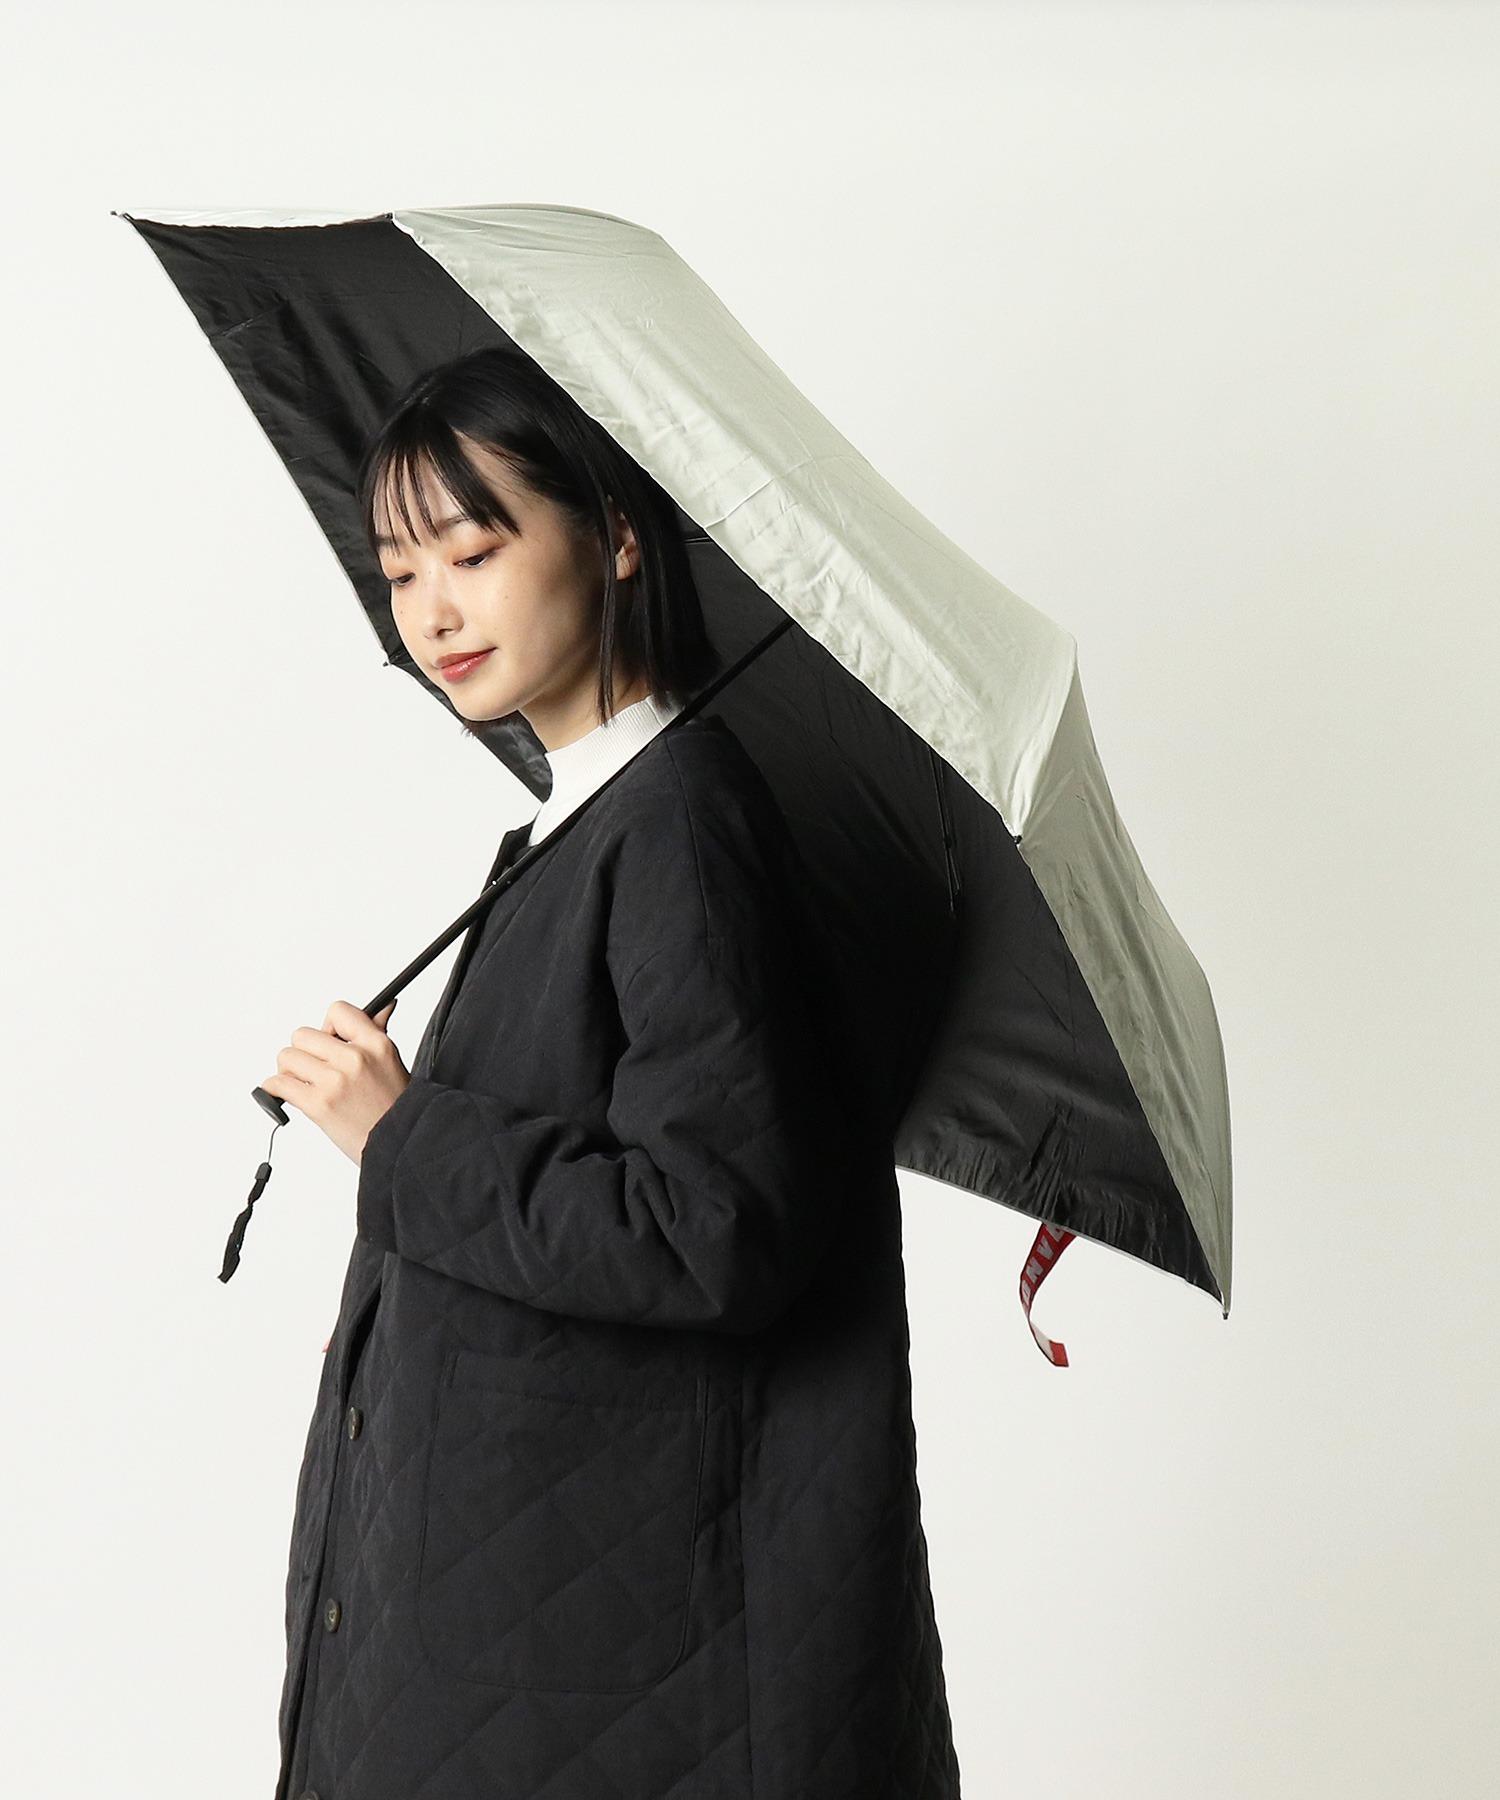 【 CONVERSE / コンバース 】 晴雨兼用 ユニセックス折りたたみ日傘 CON-MT-58M OGW ・・